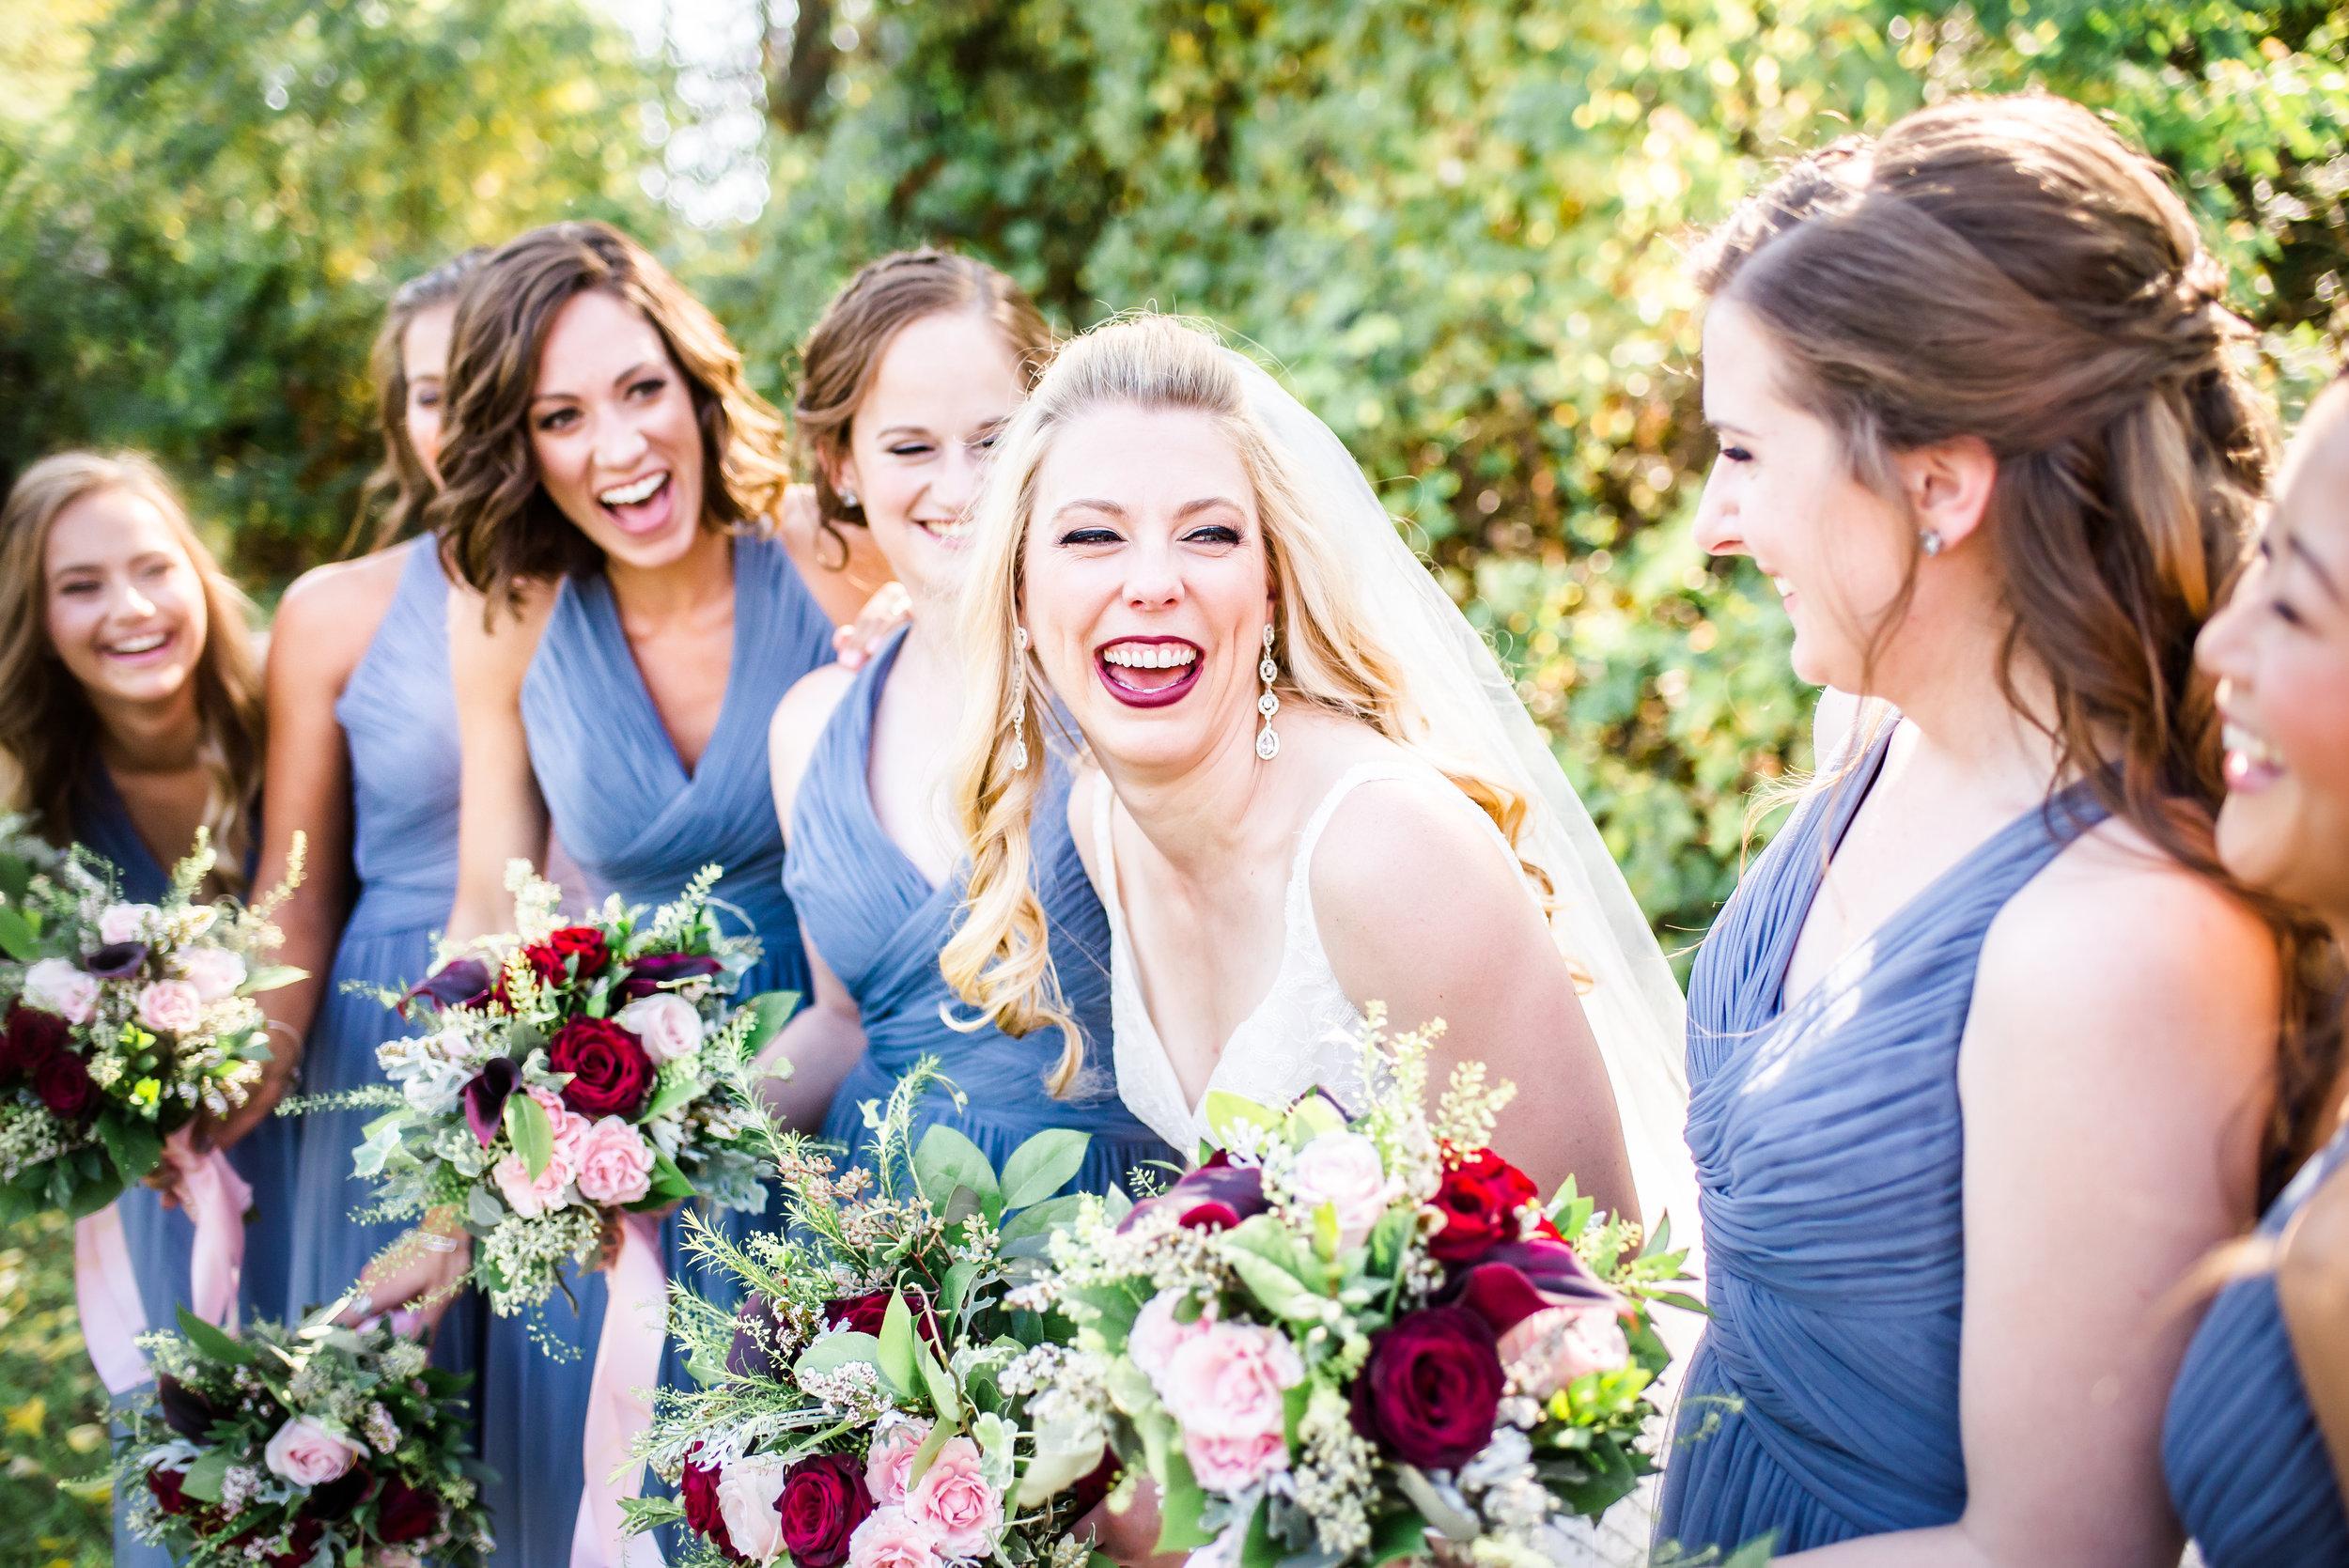 bride_bridesmaids_frenchblue_dresses.jpg